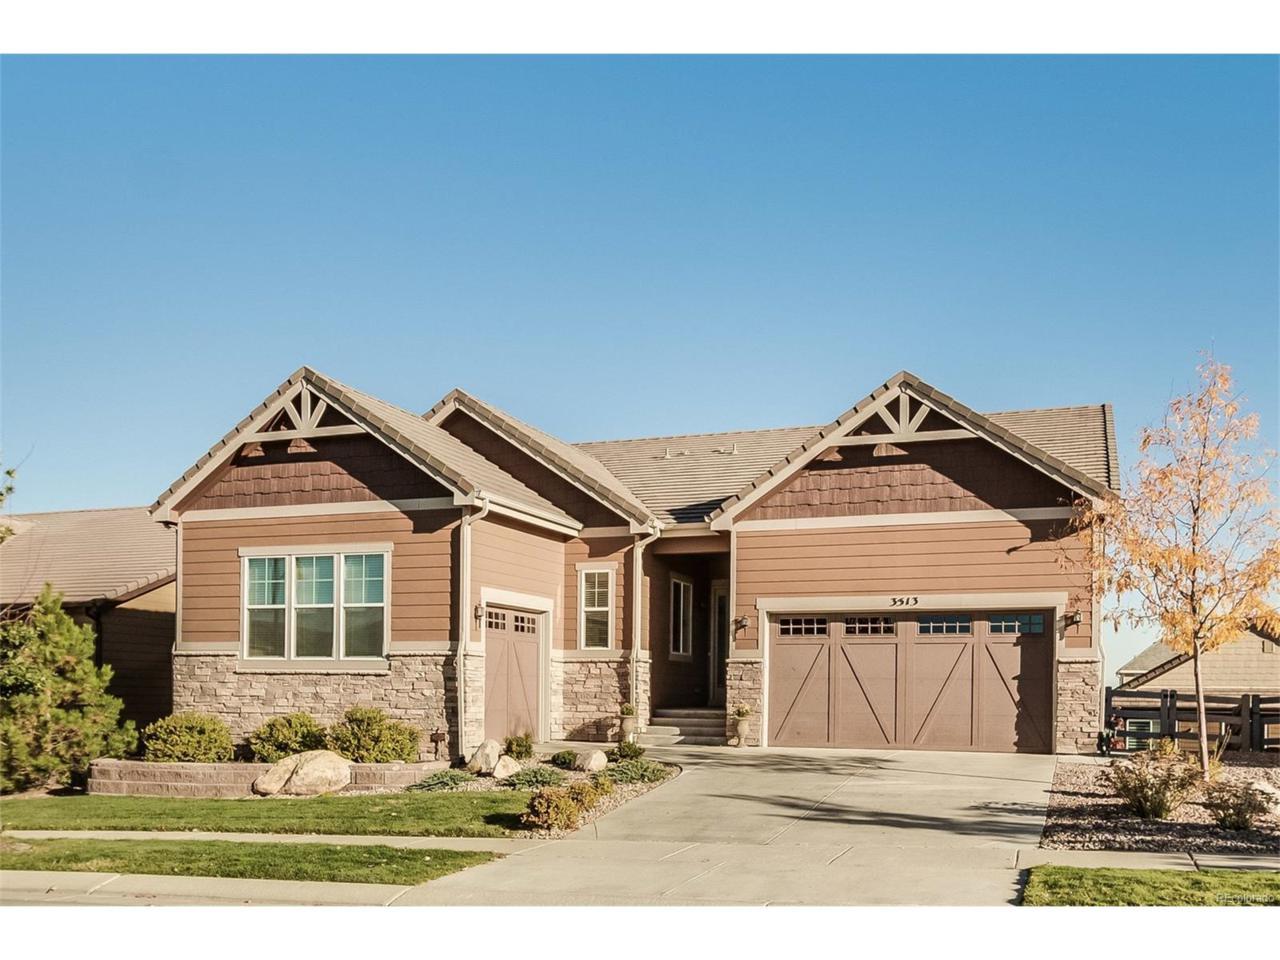 3513 Princeton Place, Broomfield, CO 80023 (#8590510) :: The Peak Properties Group